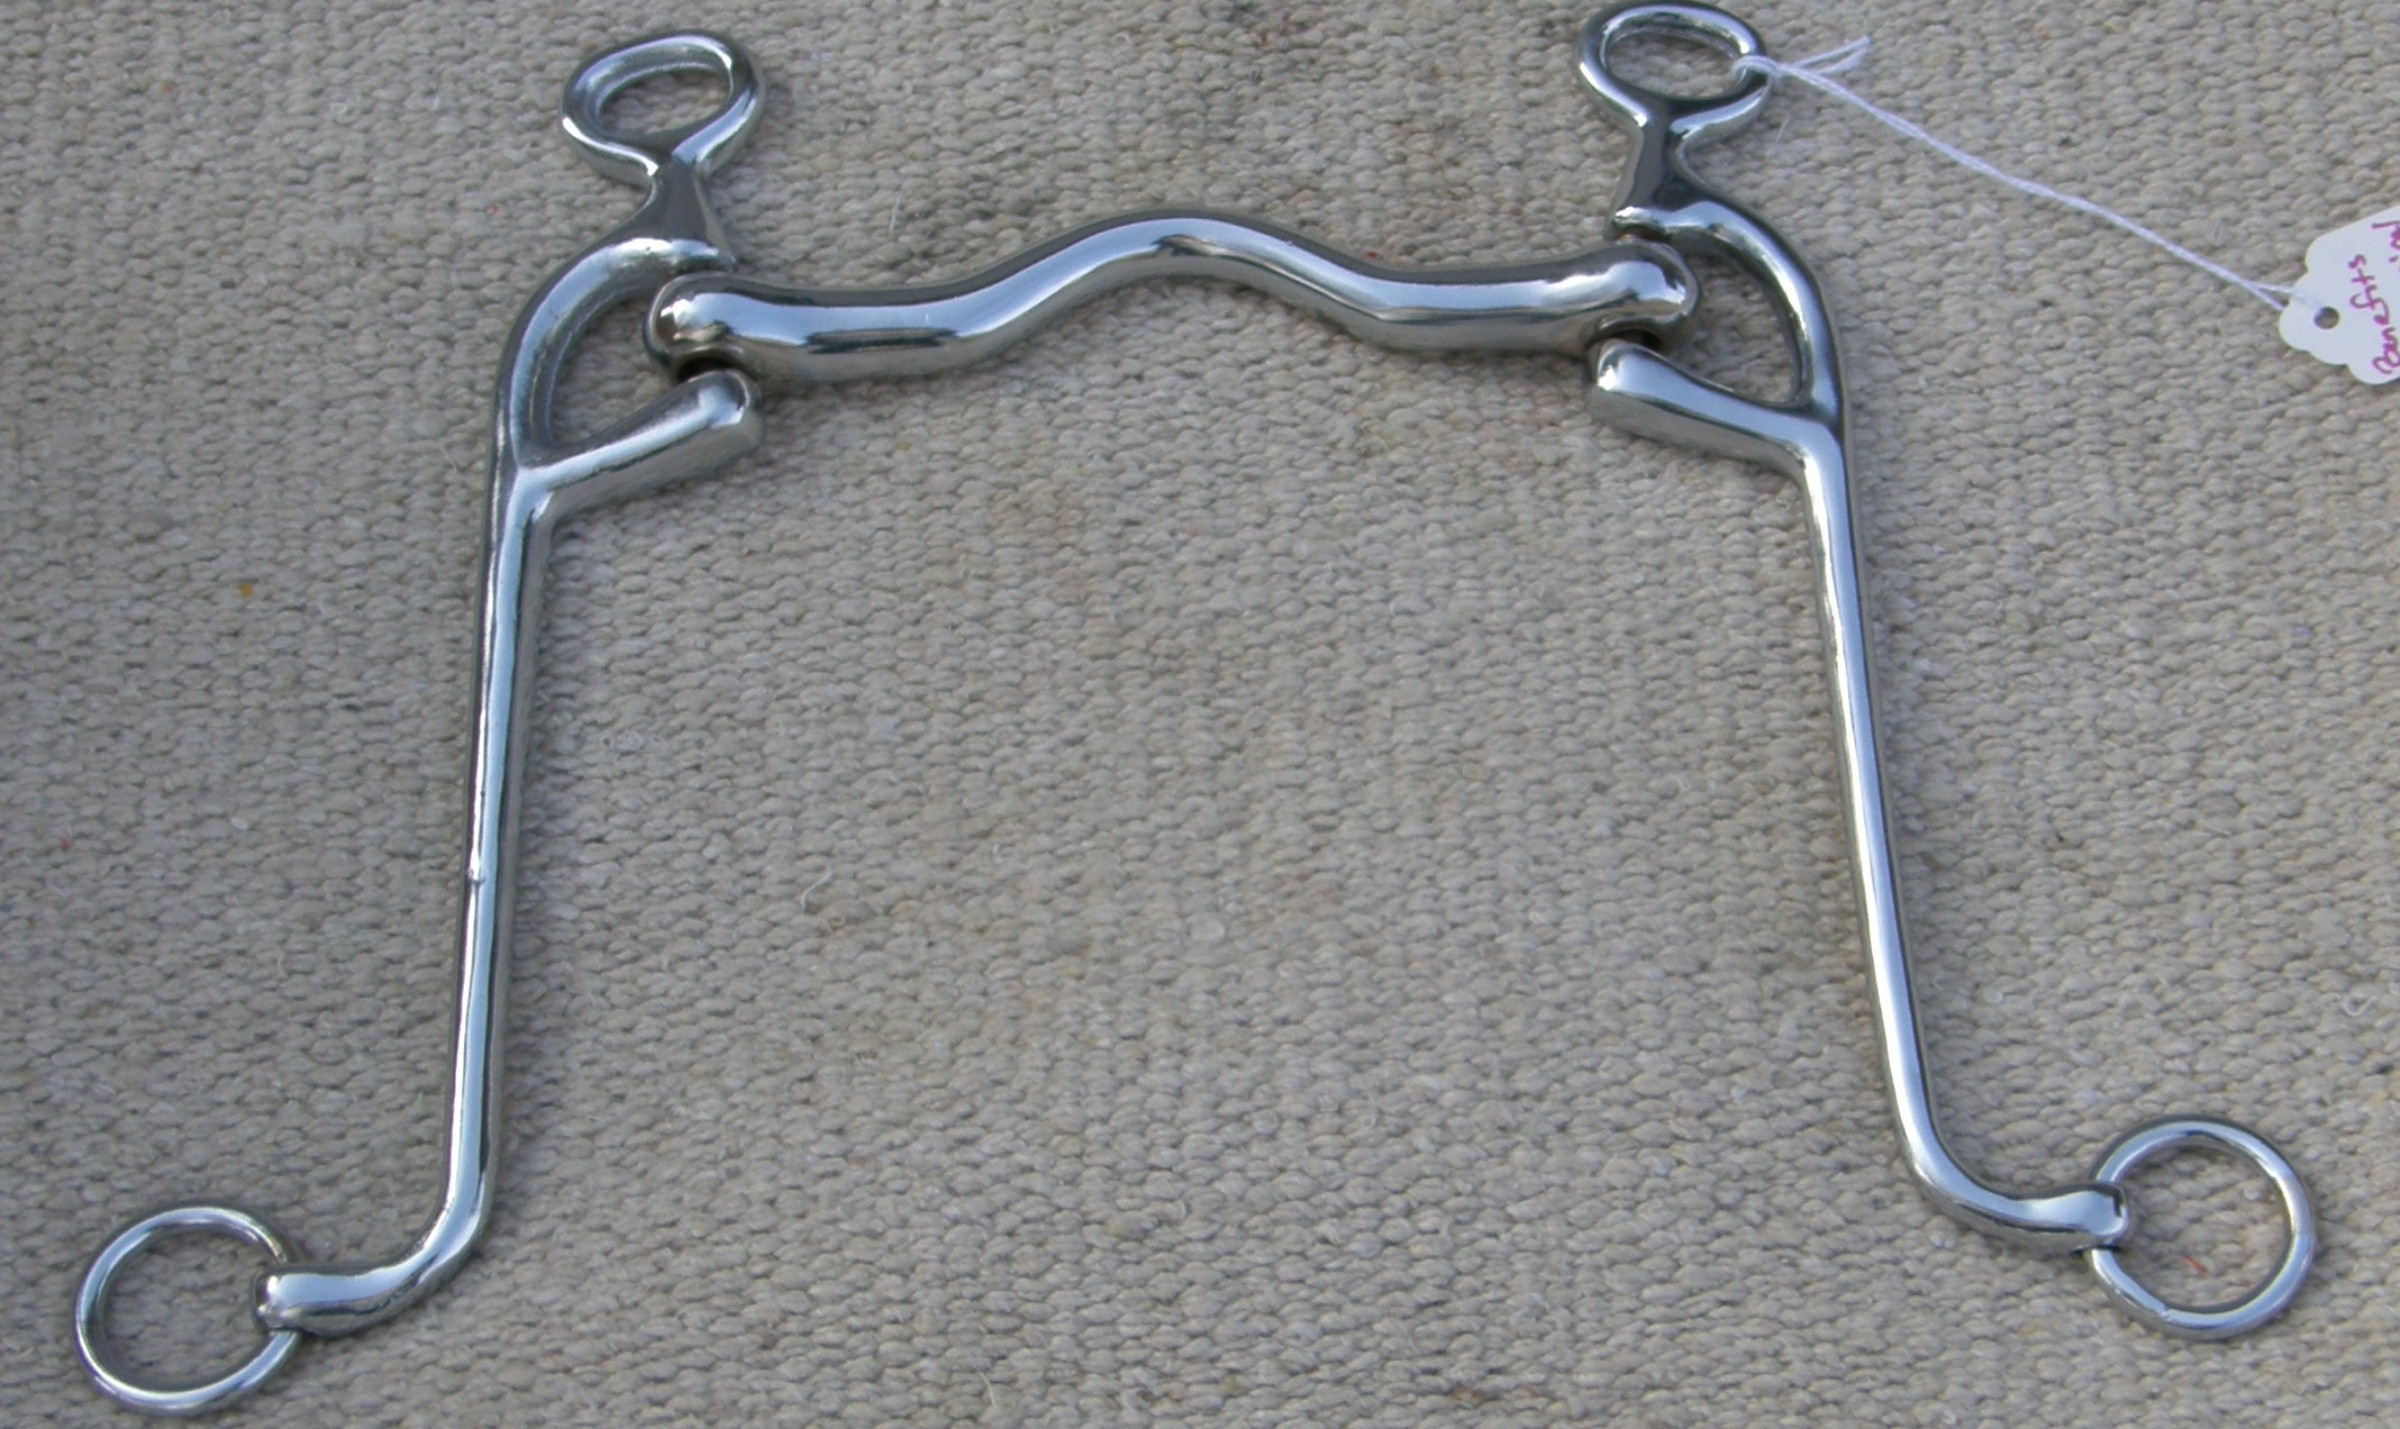 Western Low Port Horse Show Bit Hand engraved Silver bar cheeks